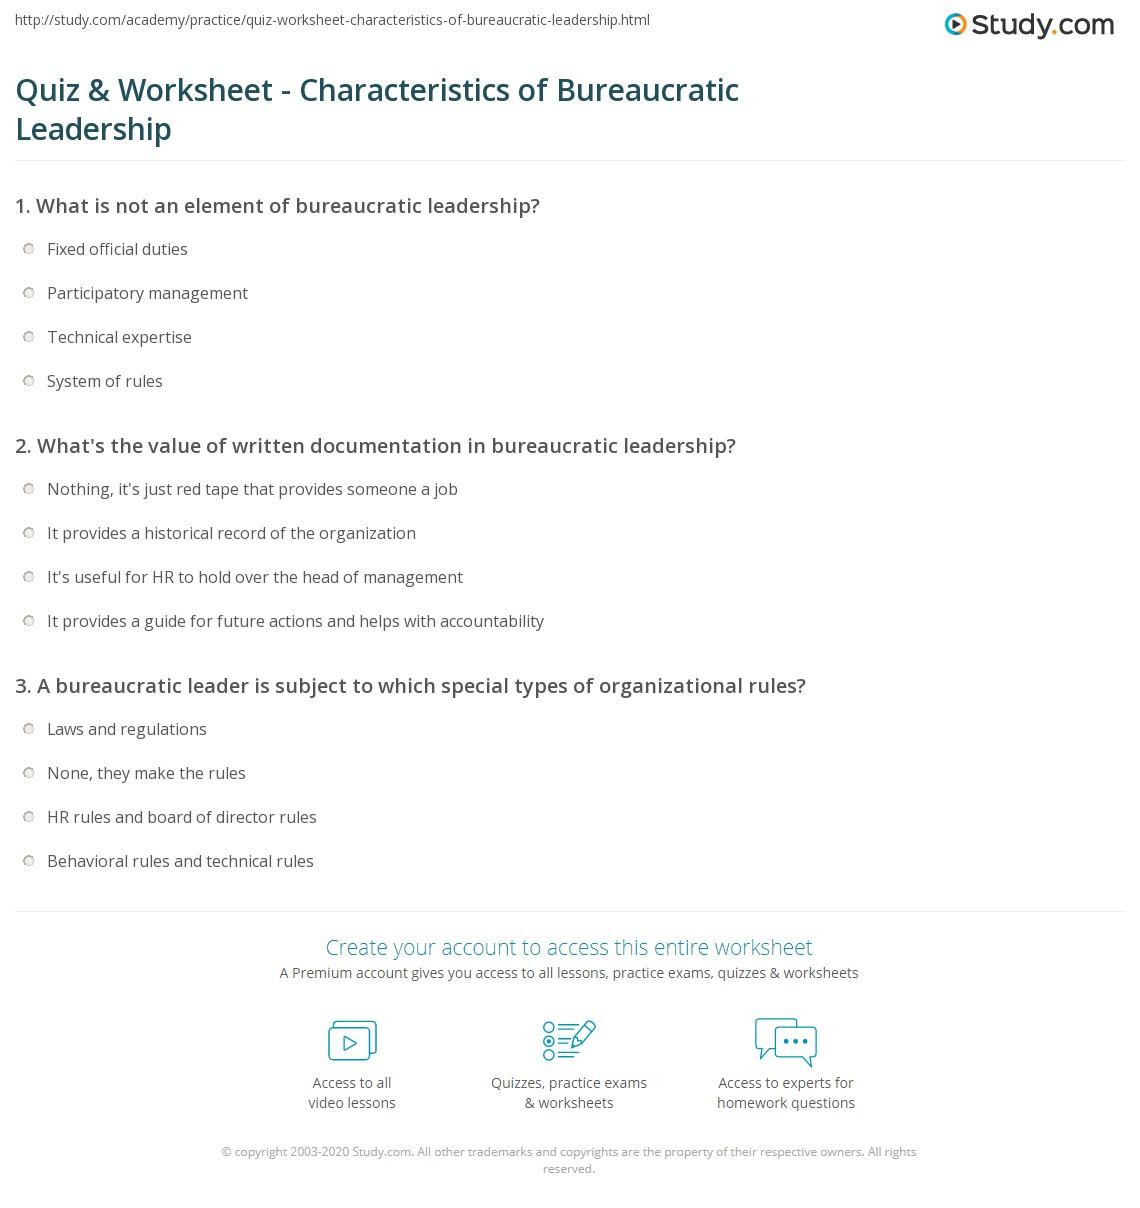 quiz & worksheet - characteristics of bureaucratic leadership